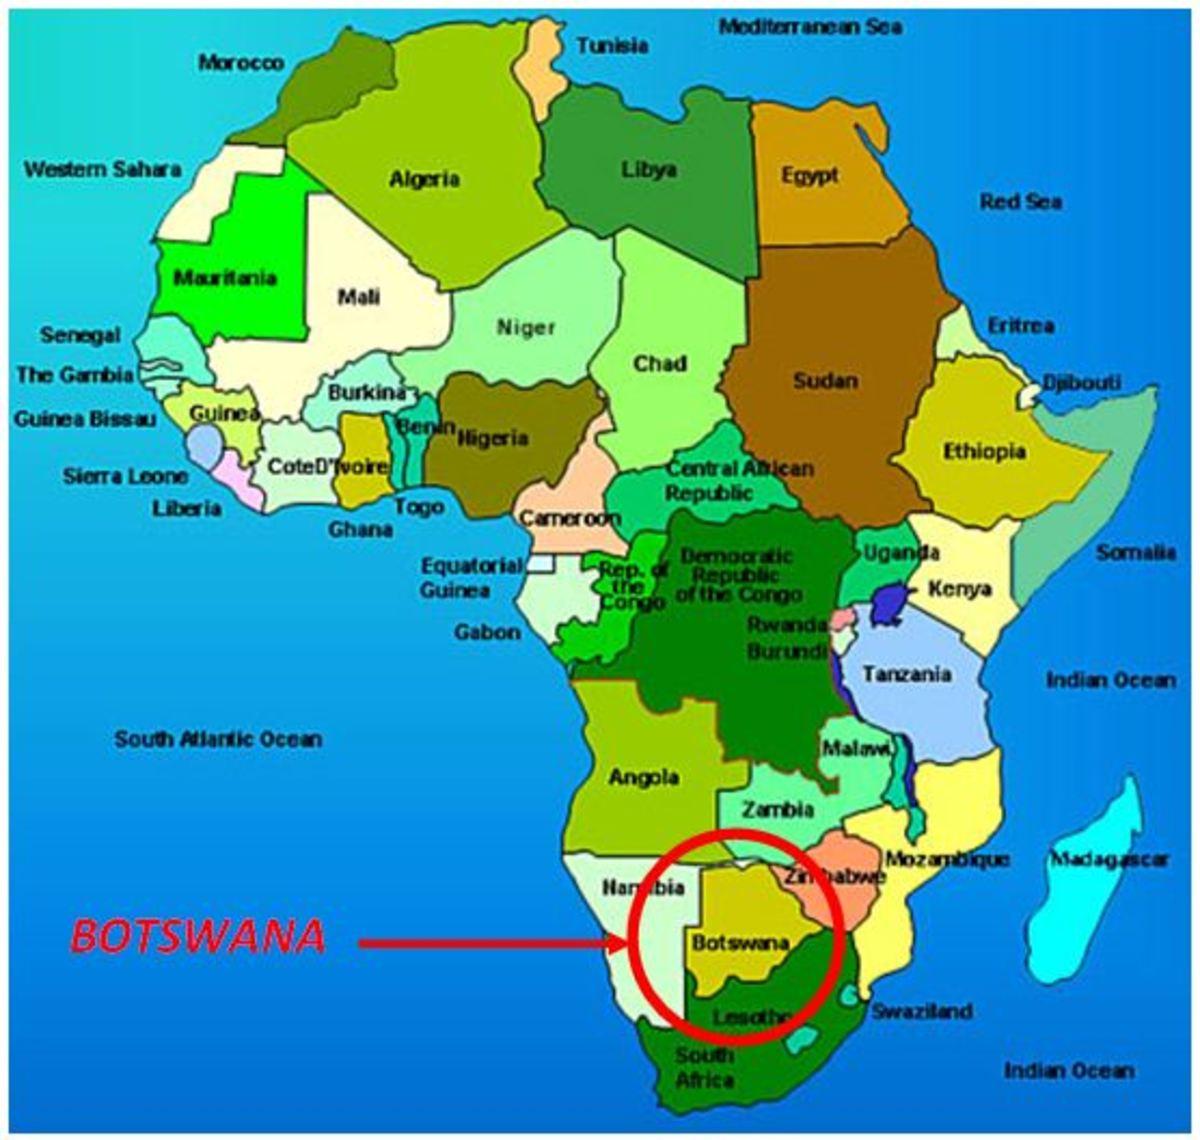 Botswana circled in red